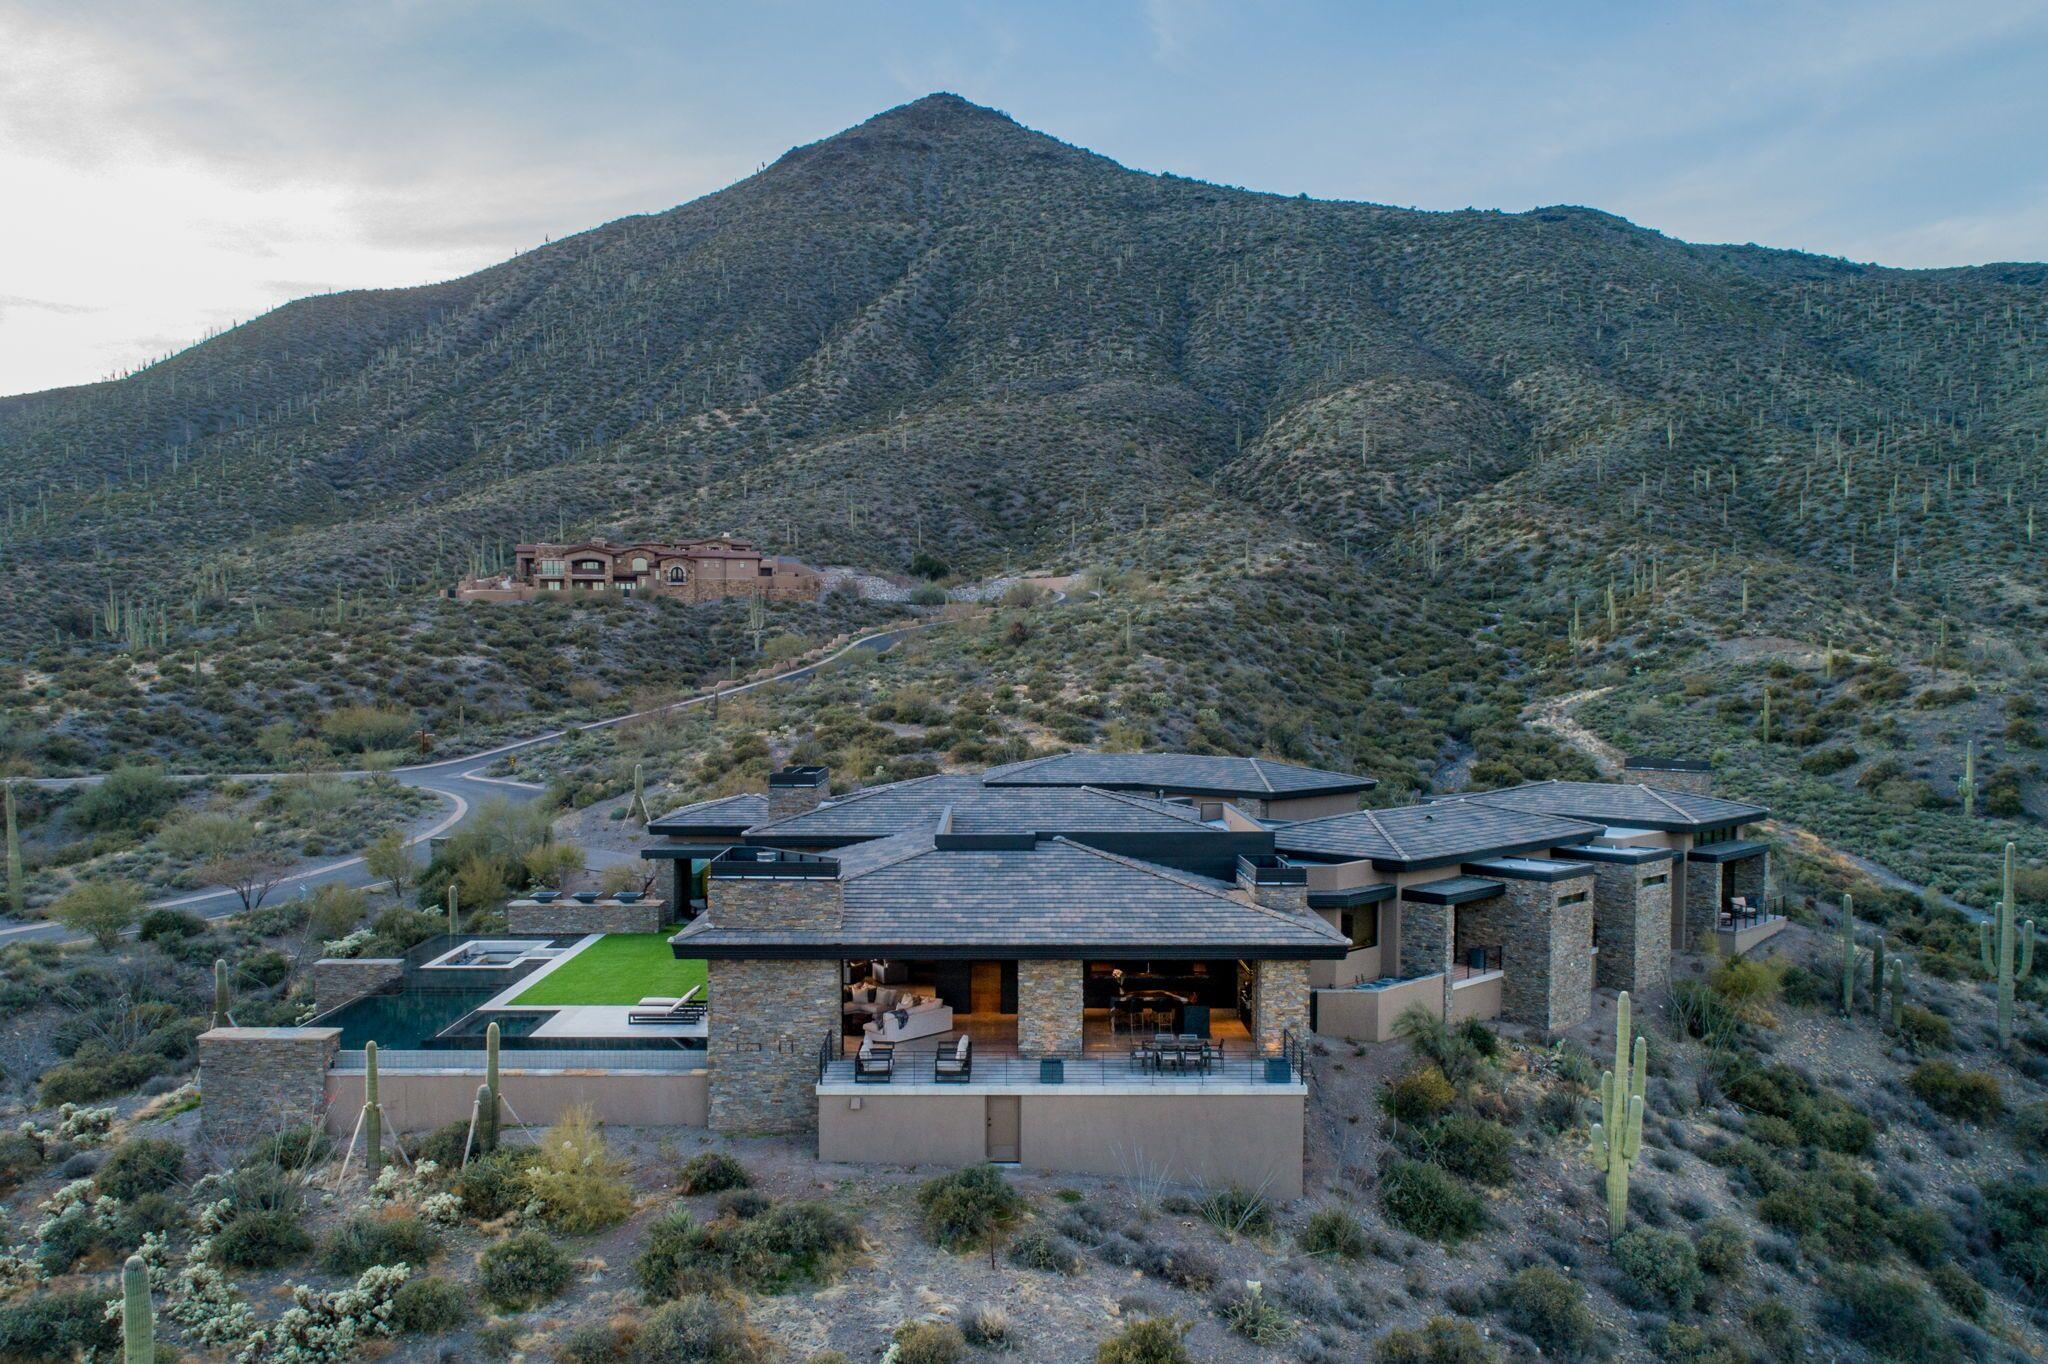 9300+E+Grapevine+Pass+Scottsdale-64-WebQuality-Mountain+Lot.jpg